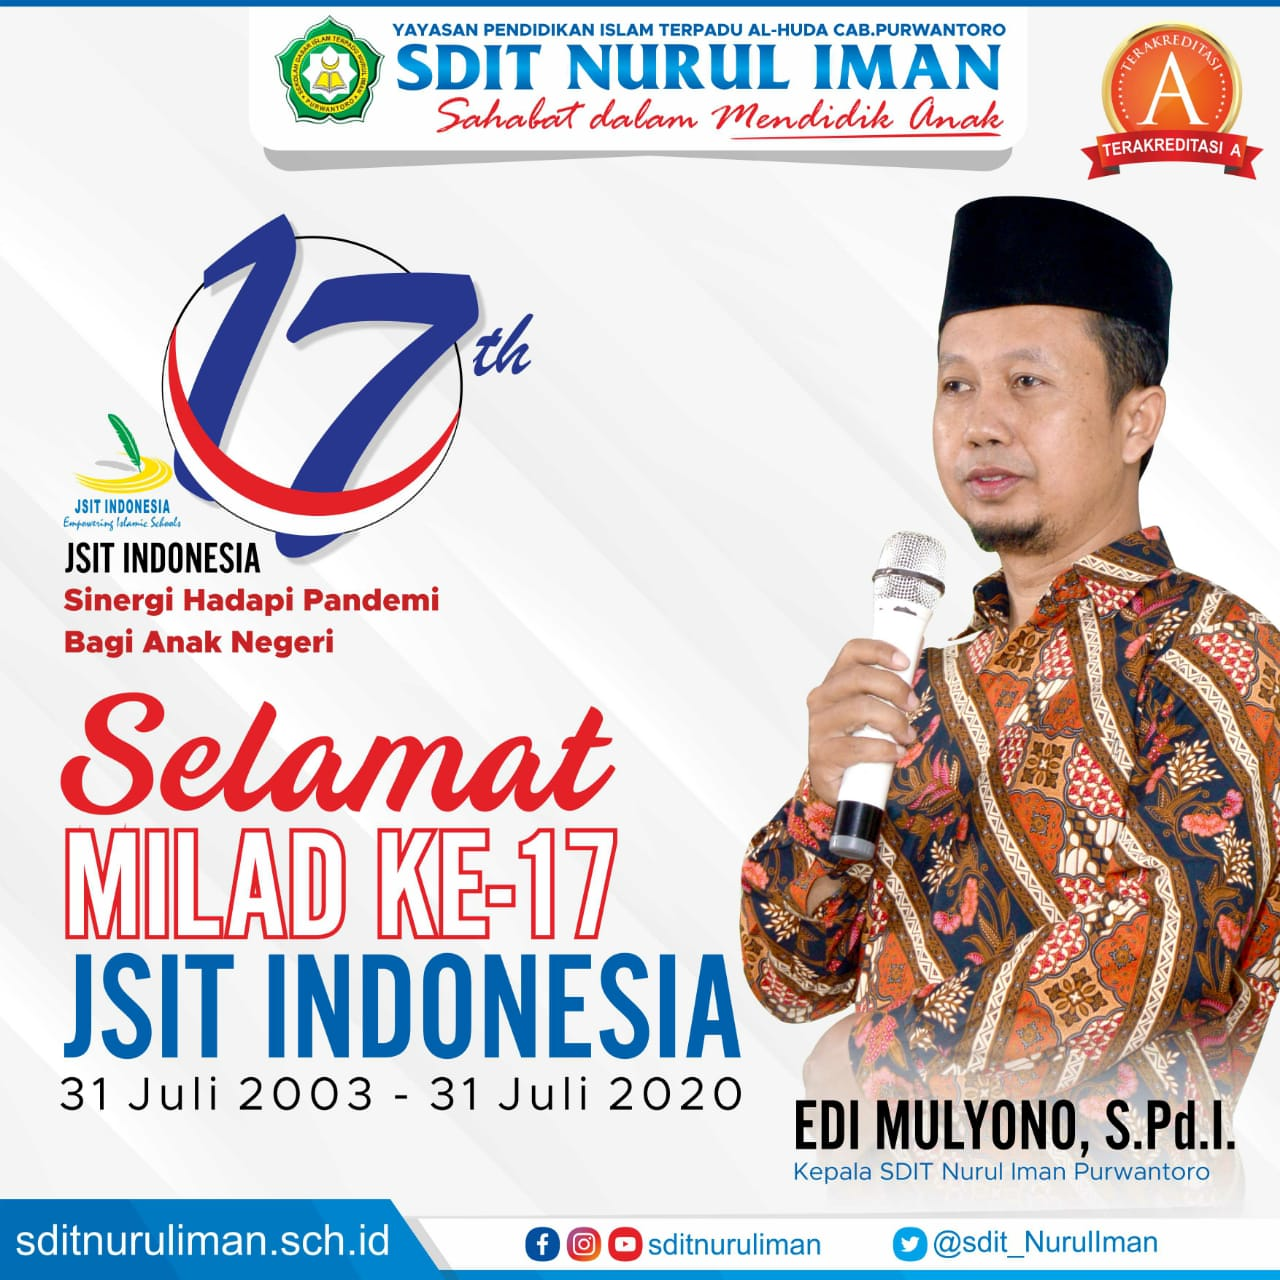 Selamat Milad Ke-17 JSIT Indonesia